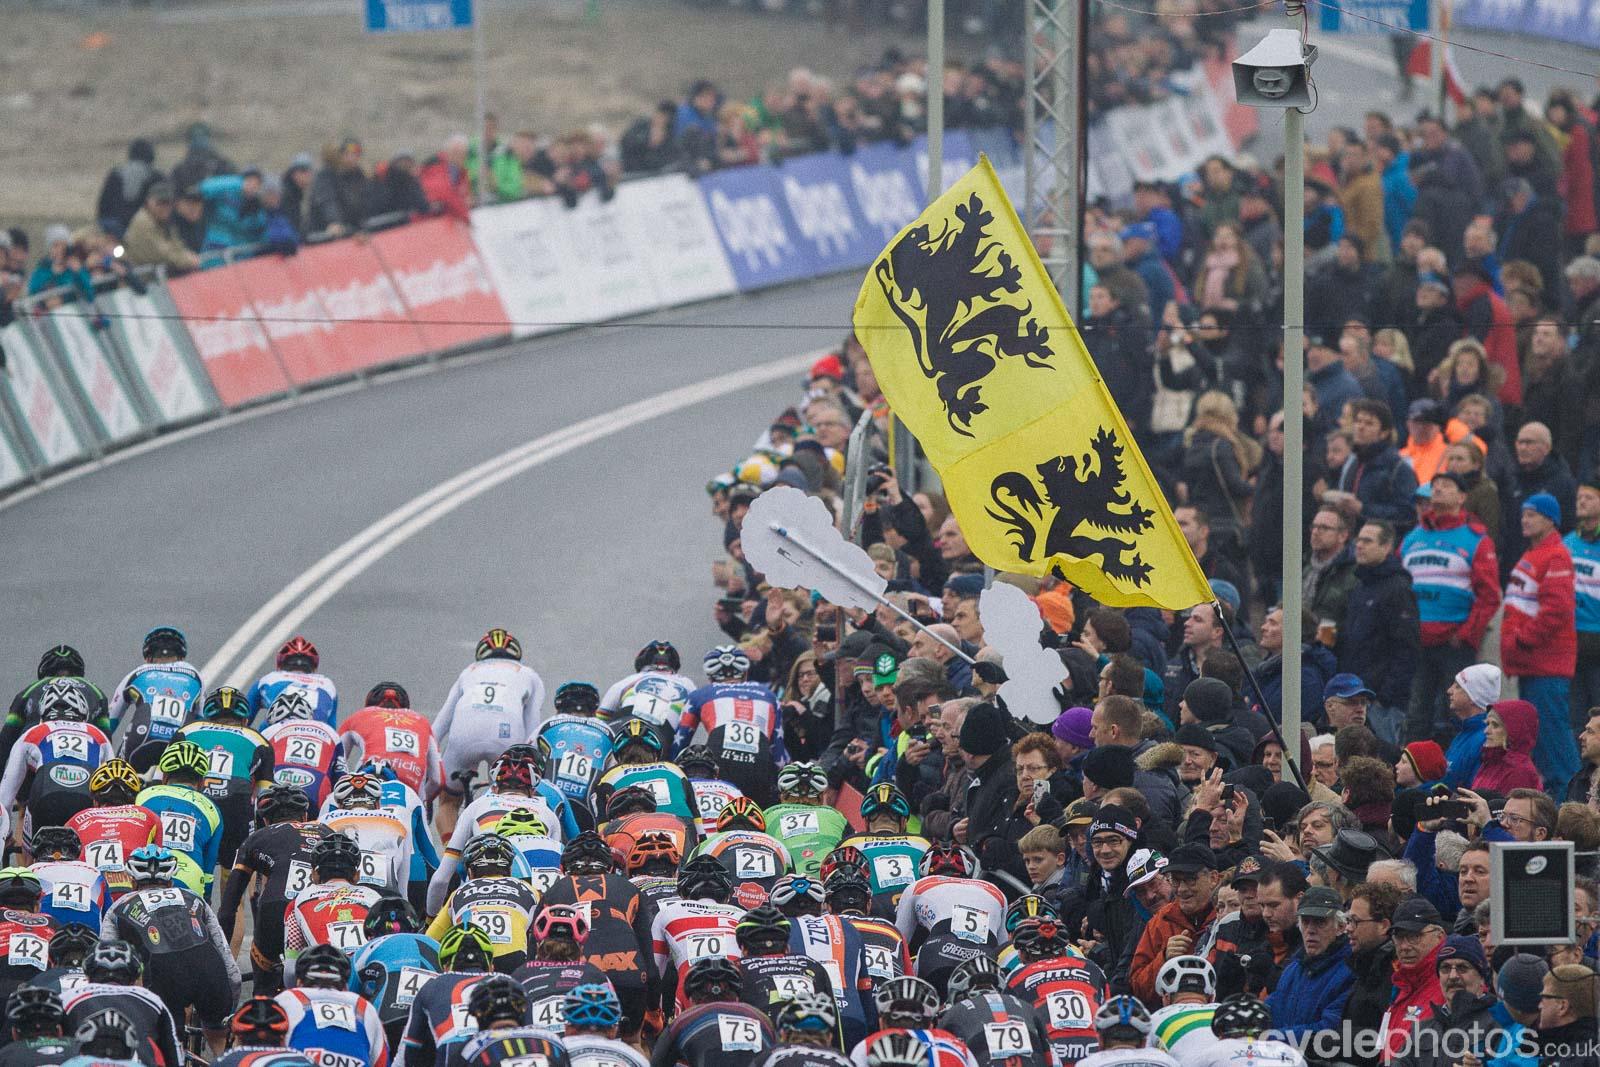 2016-cyclephotos-cyclocross-hoogerheide-150003-start